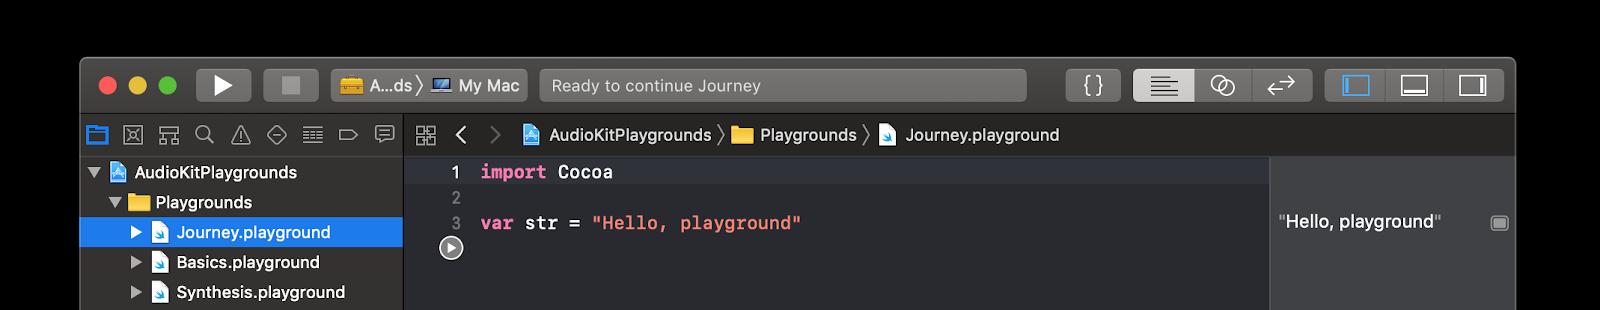 AudioKit и синтезирование звука в iOS-OSX - 2